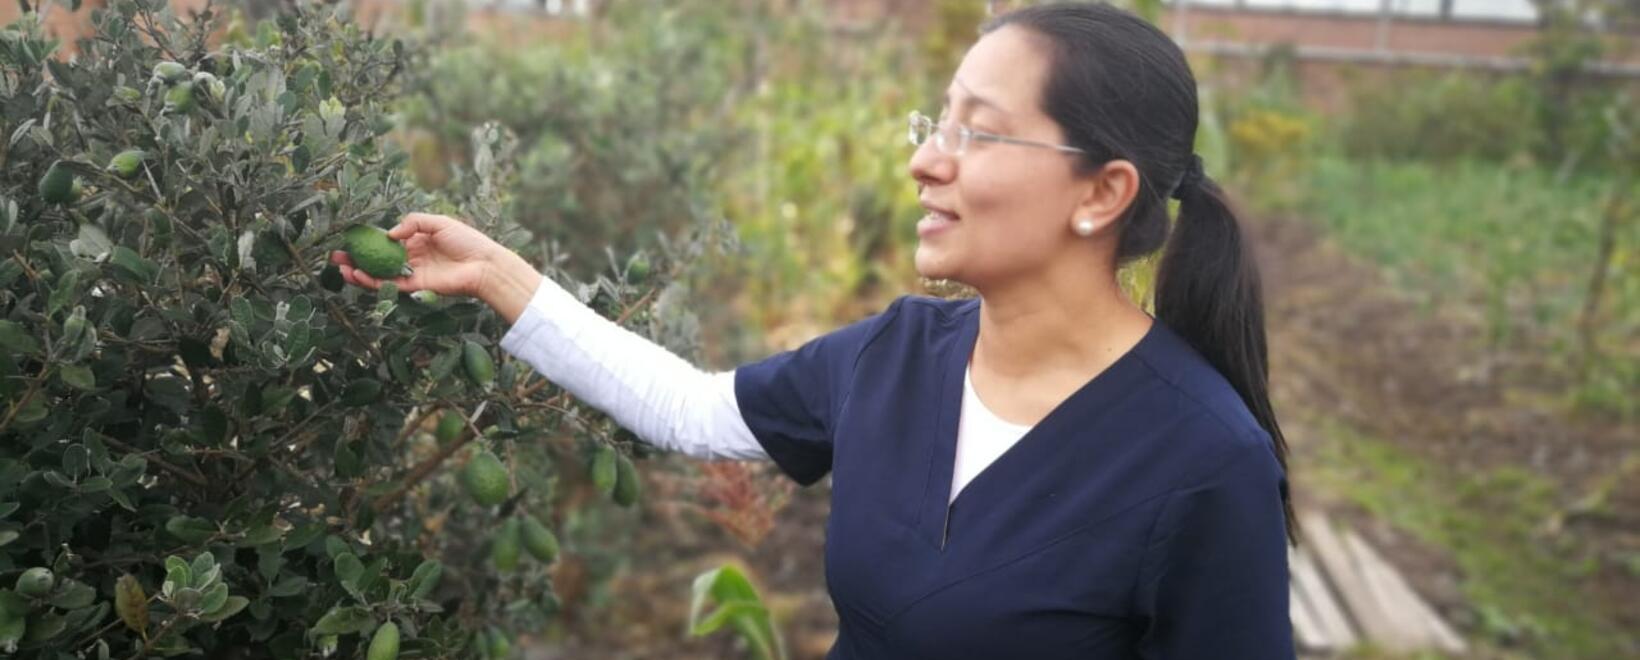 Naileth Aguirre, agricultora urbana